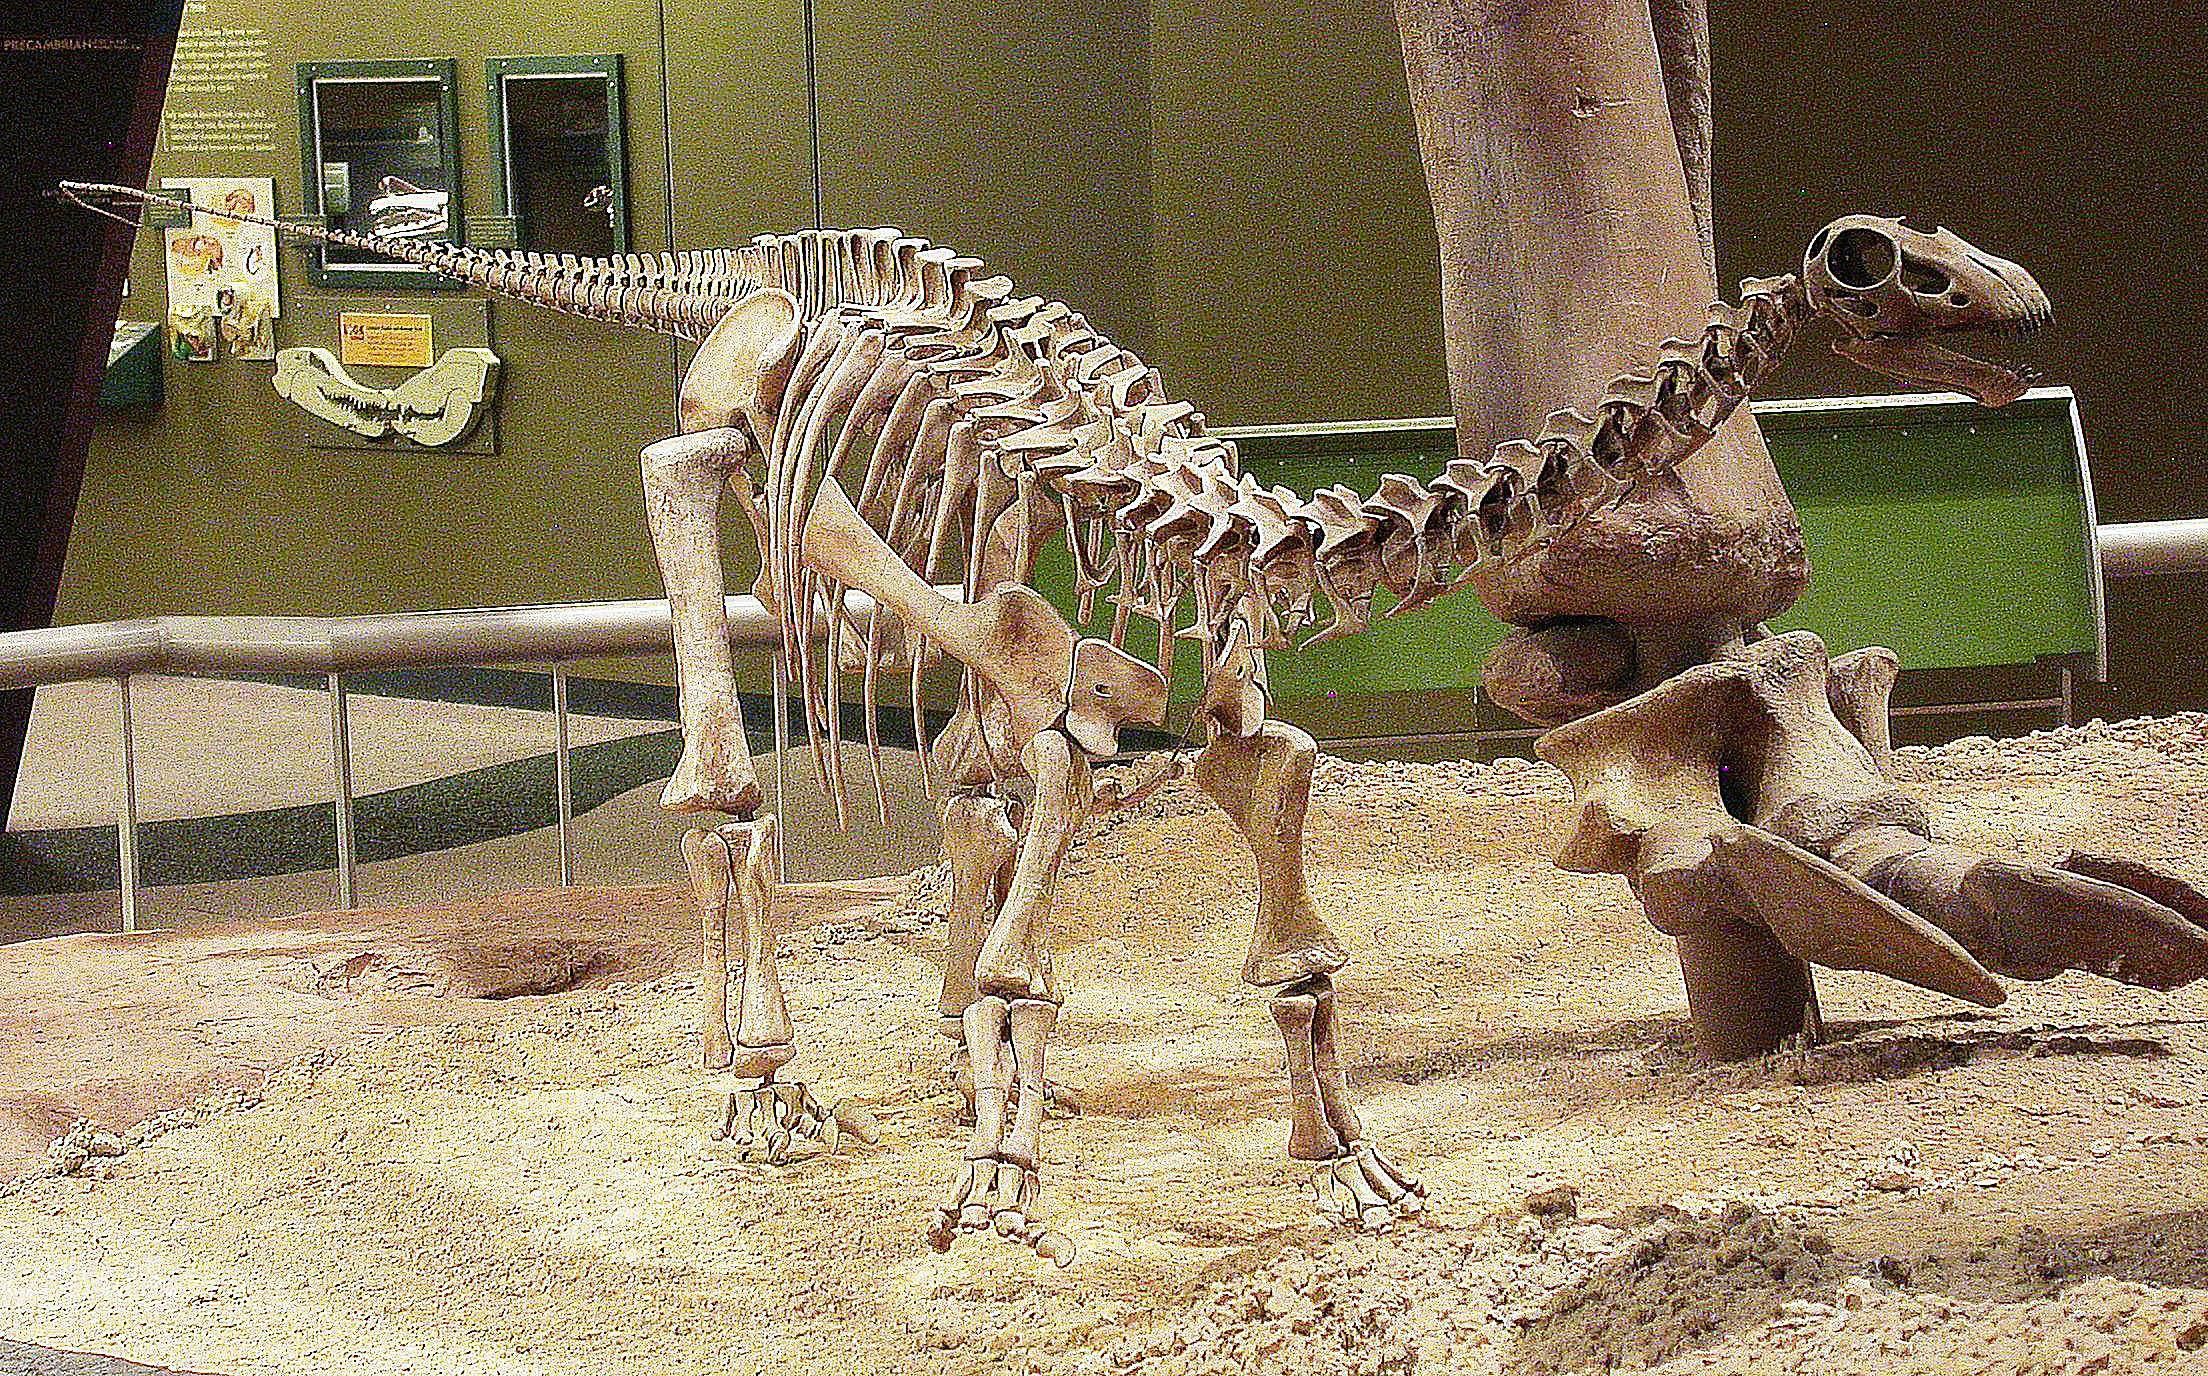 A juvenile Apatosaurus